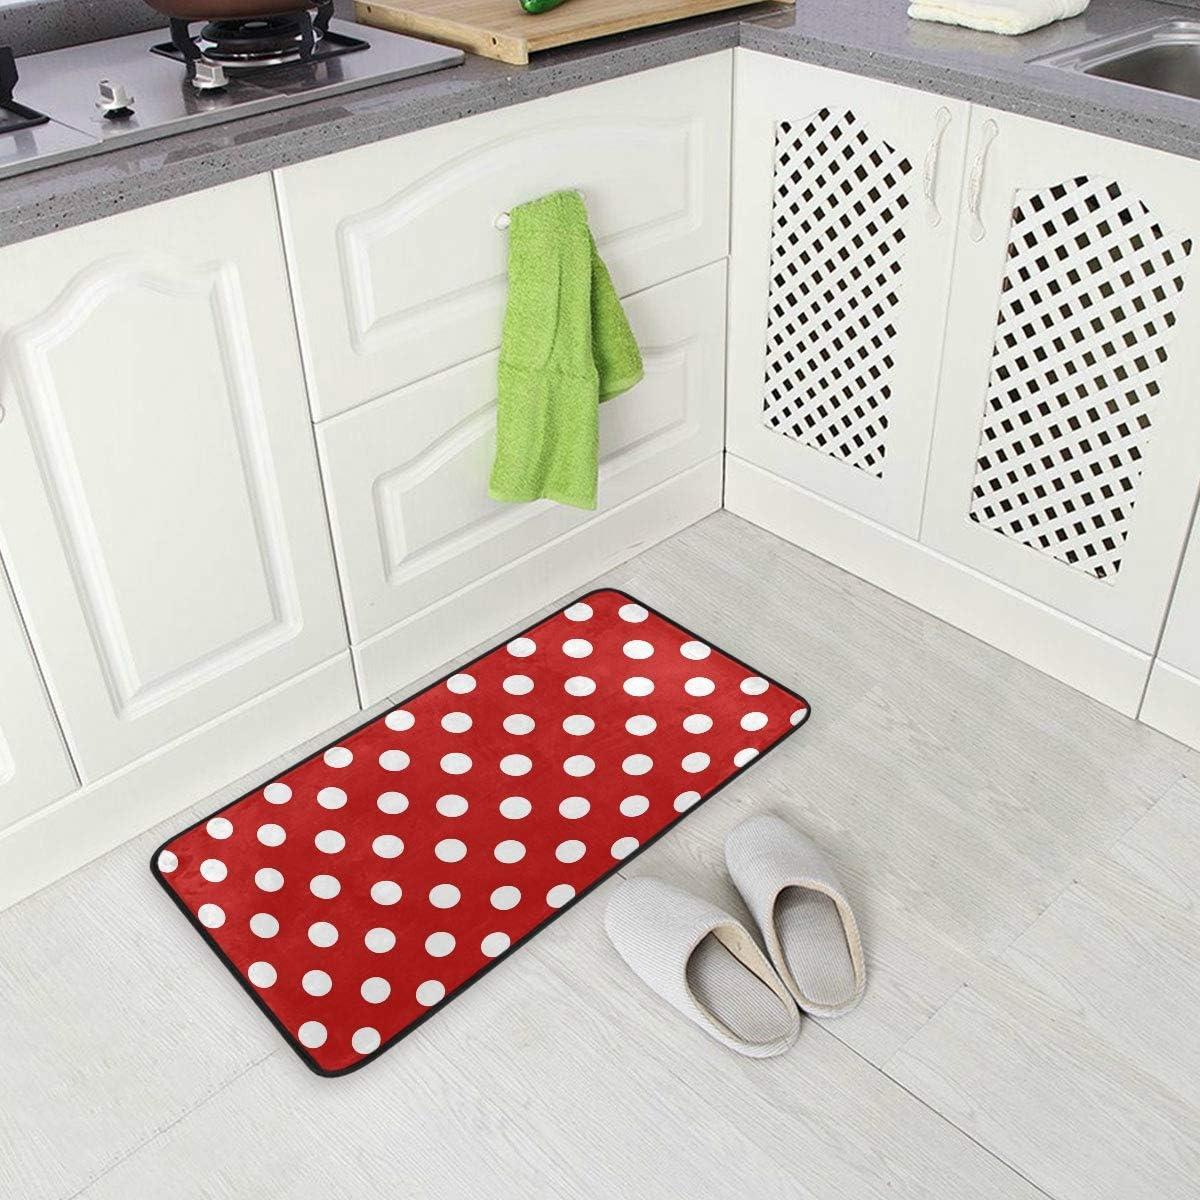 Amazon Com Vikko White Red Polka Dot Kitchen Area Rugs Home Decor 39 X 20 Inch Non Slip Floor Mat Machine Washable Runner Rug For Indoor Living Room Bedroom Doormats Pads